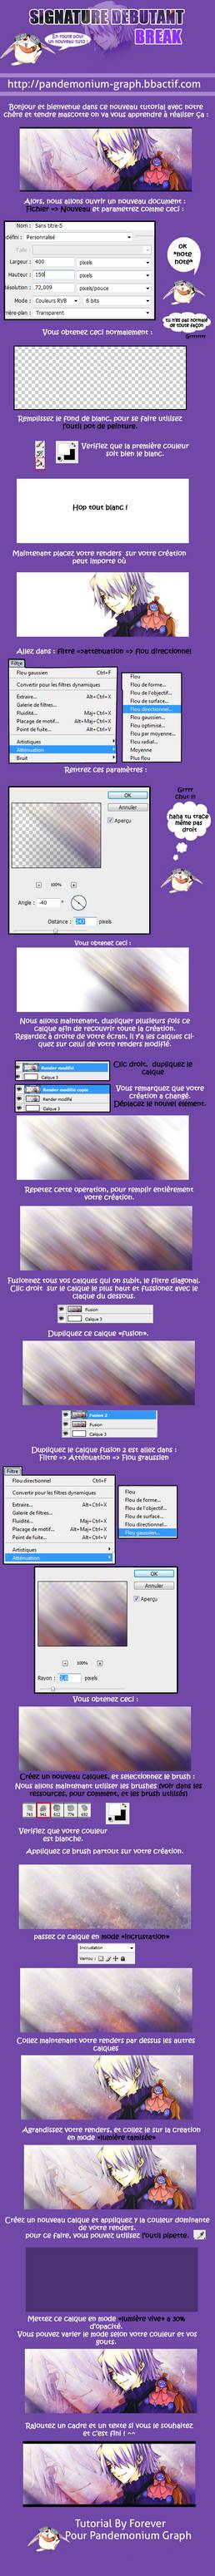 Tutoriel Debutant Photoshop - Break -